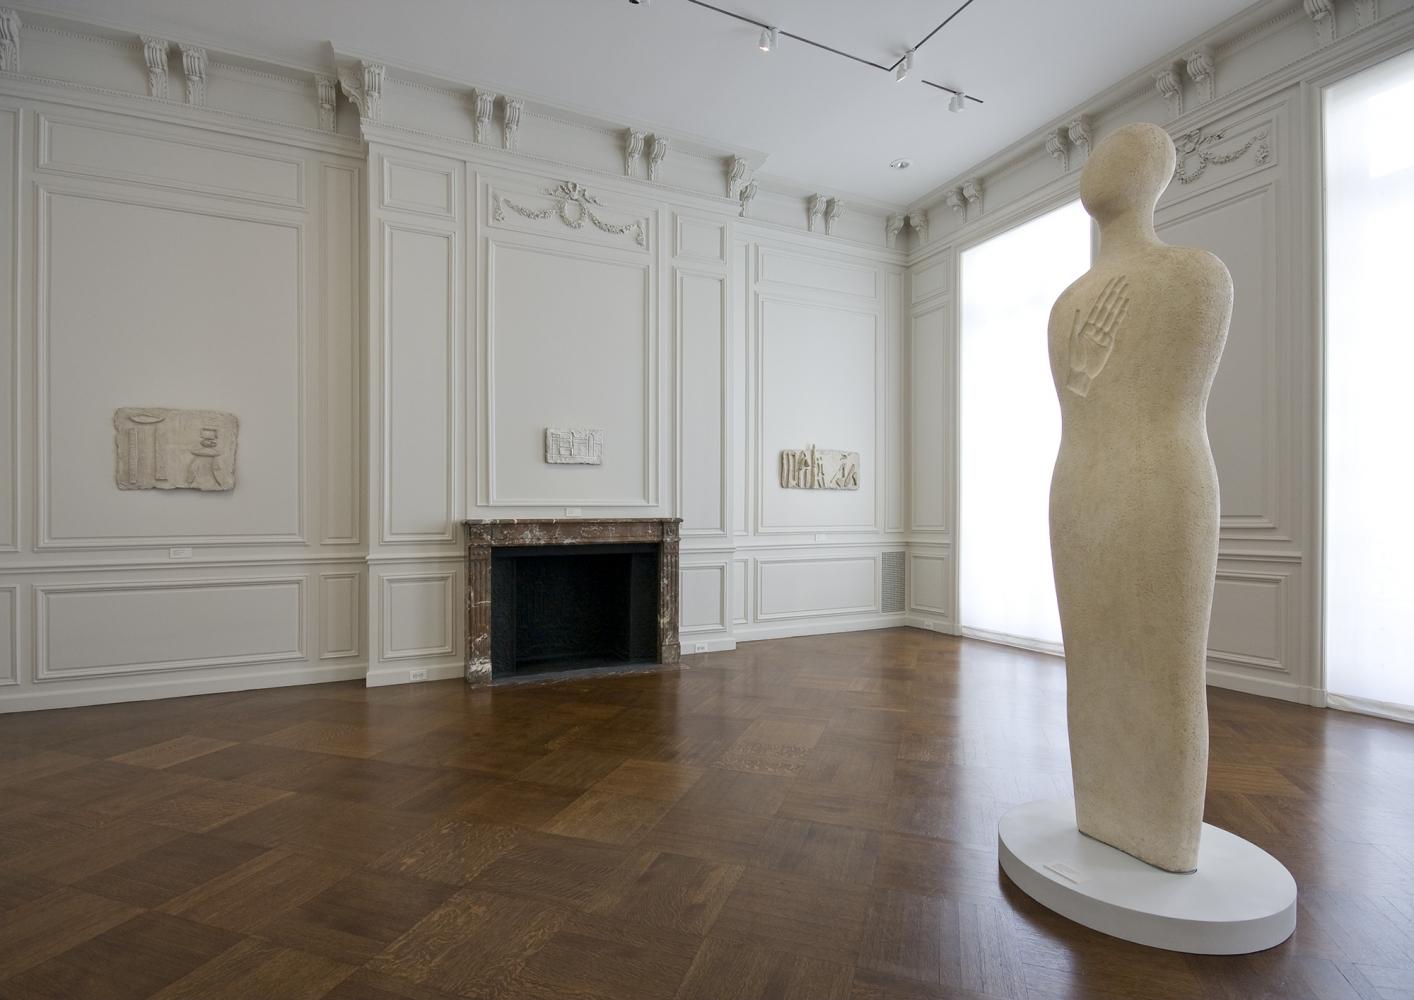 Installation view of Fausto Melotti